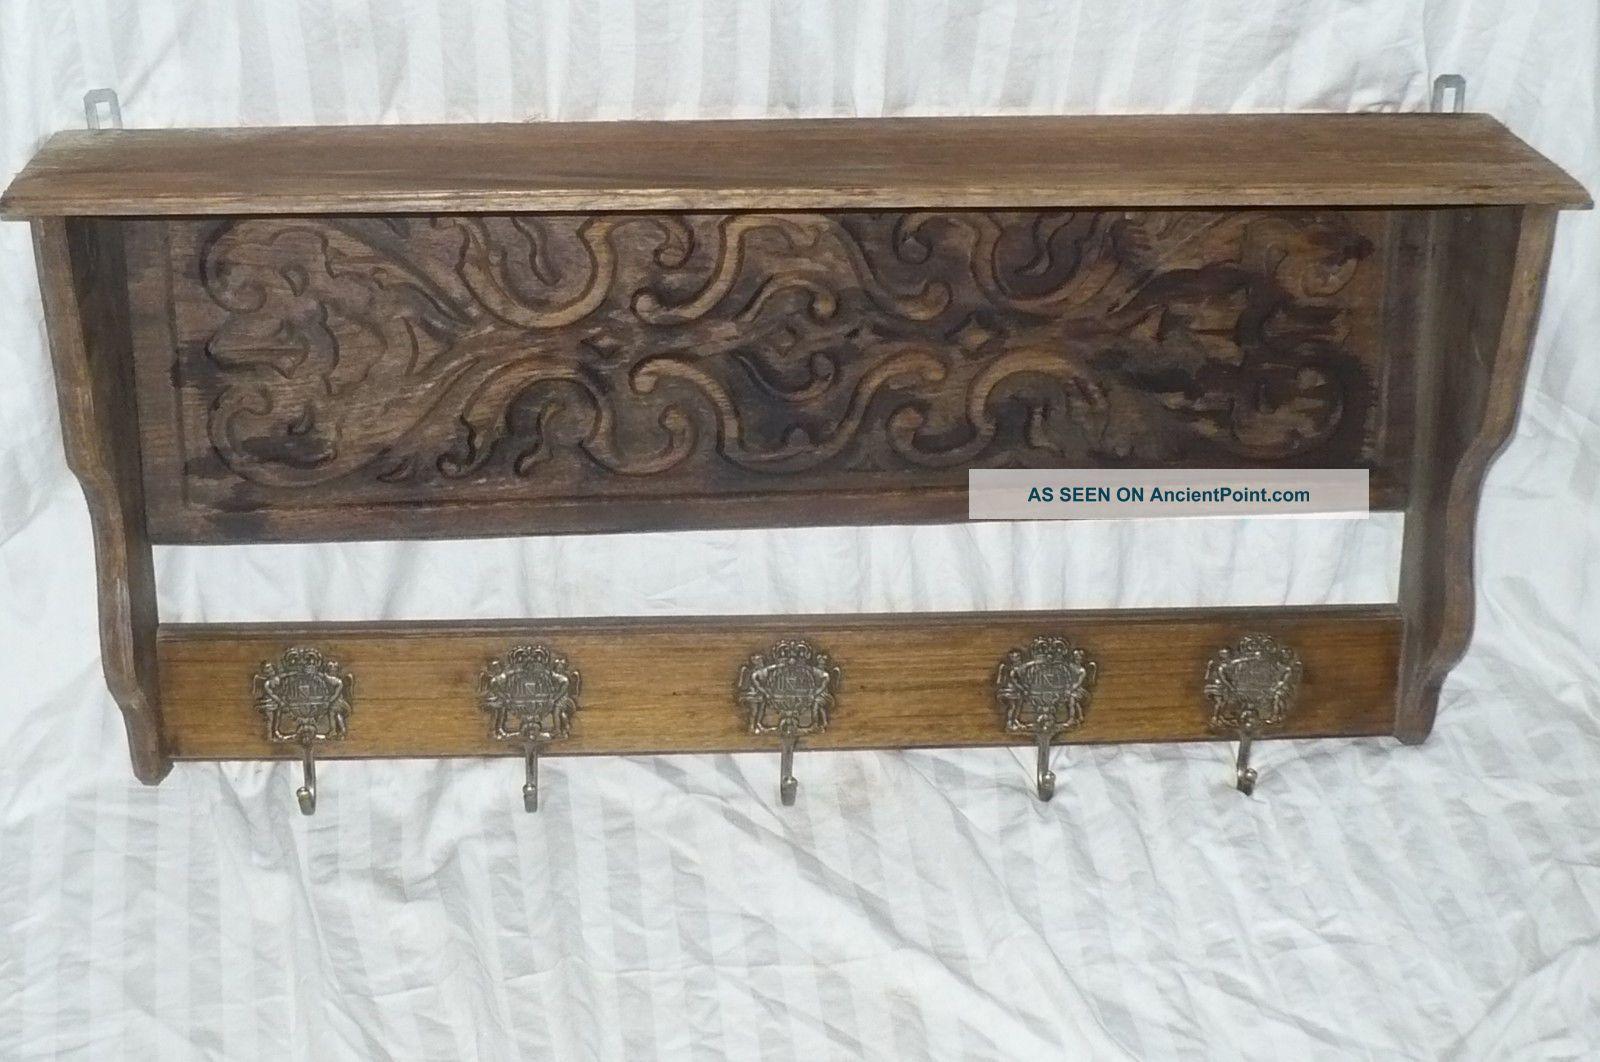 Antique Wood Carved Kitchen Copper Pot Rack Mud Room 5 Brass Hooks 1800-1899 photo